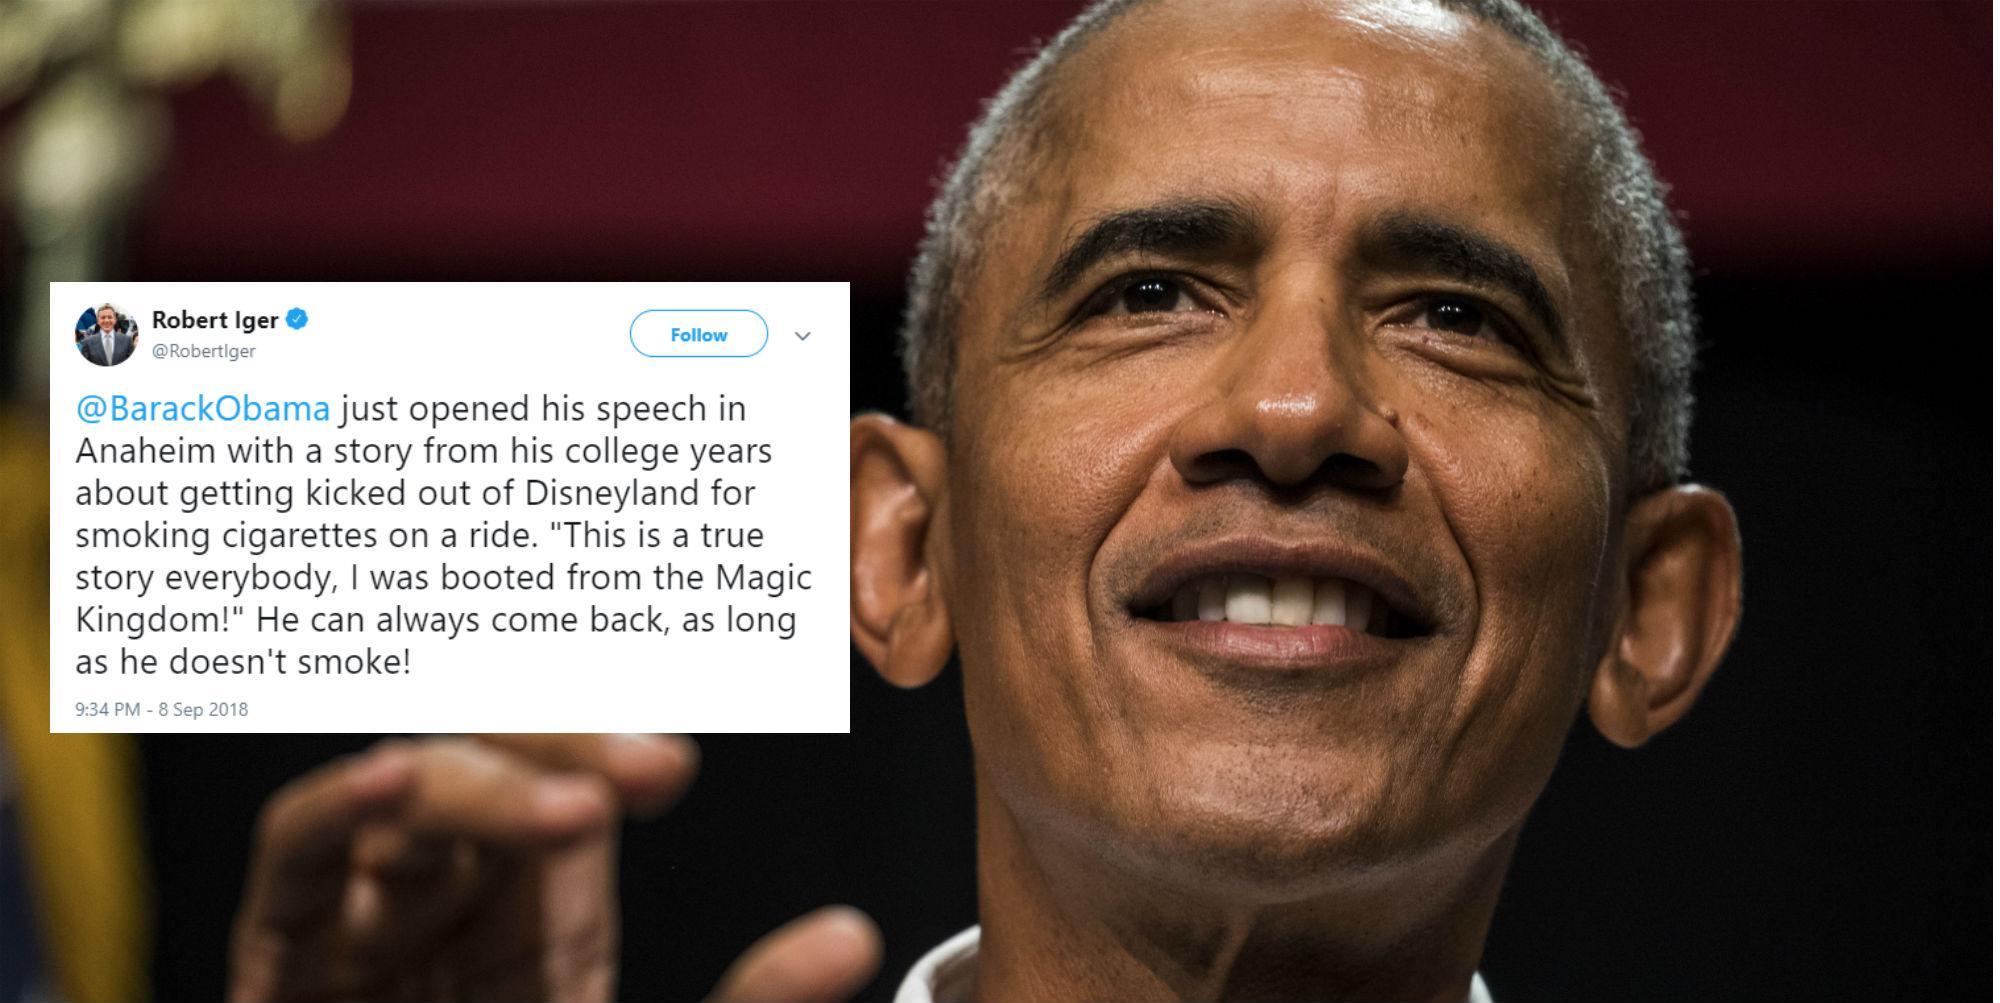 Barack Obama reveals he once got kicked out of Disneyland for